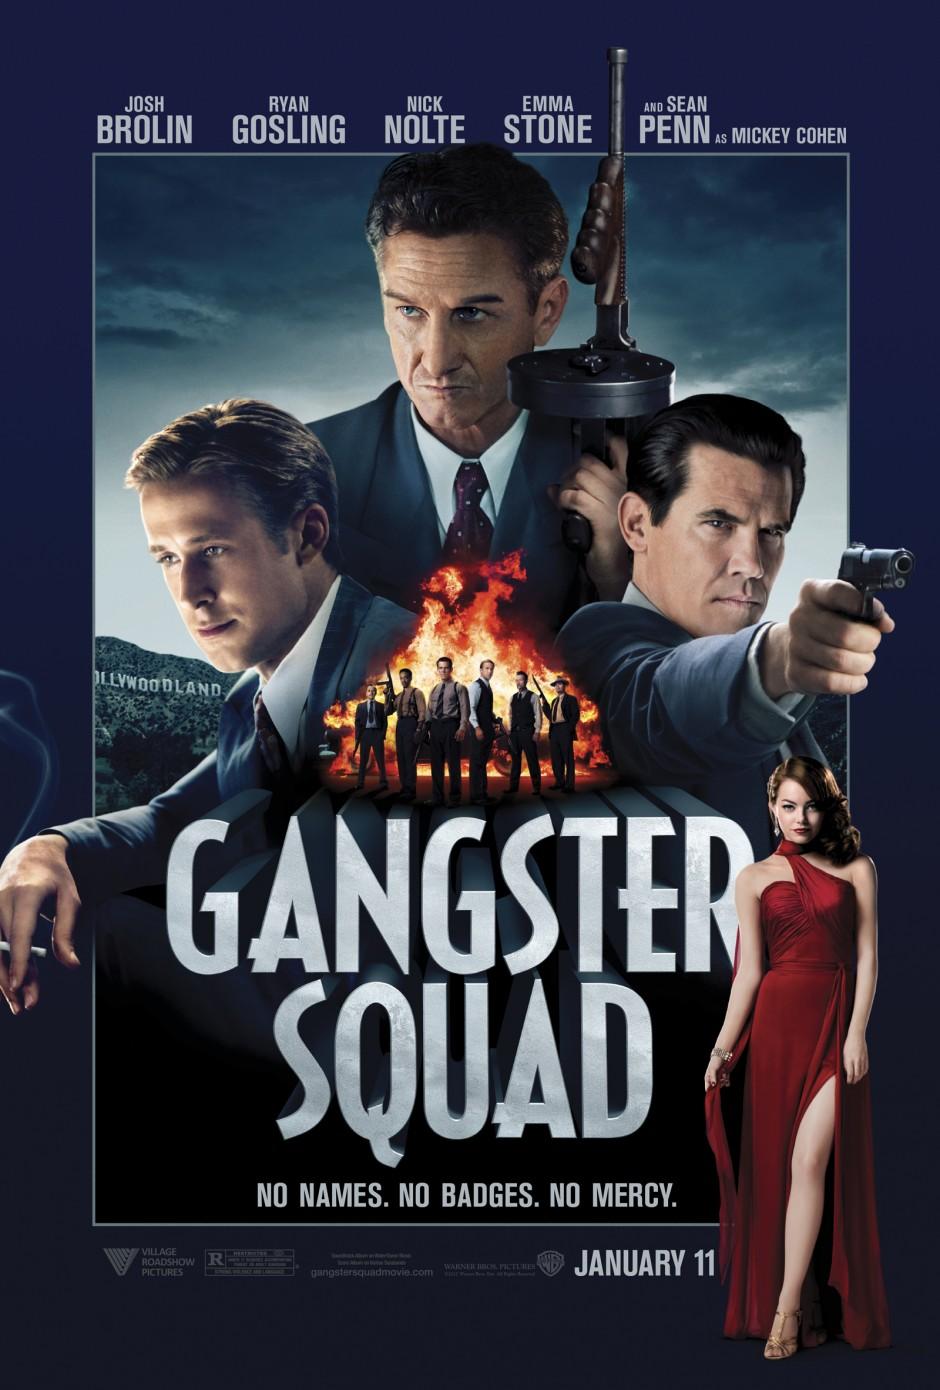 Gangster-Squad-2012-Movie-Poster-e1349906504319.jpg